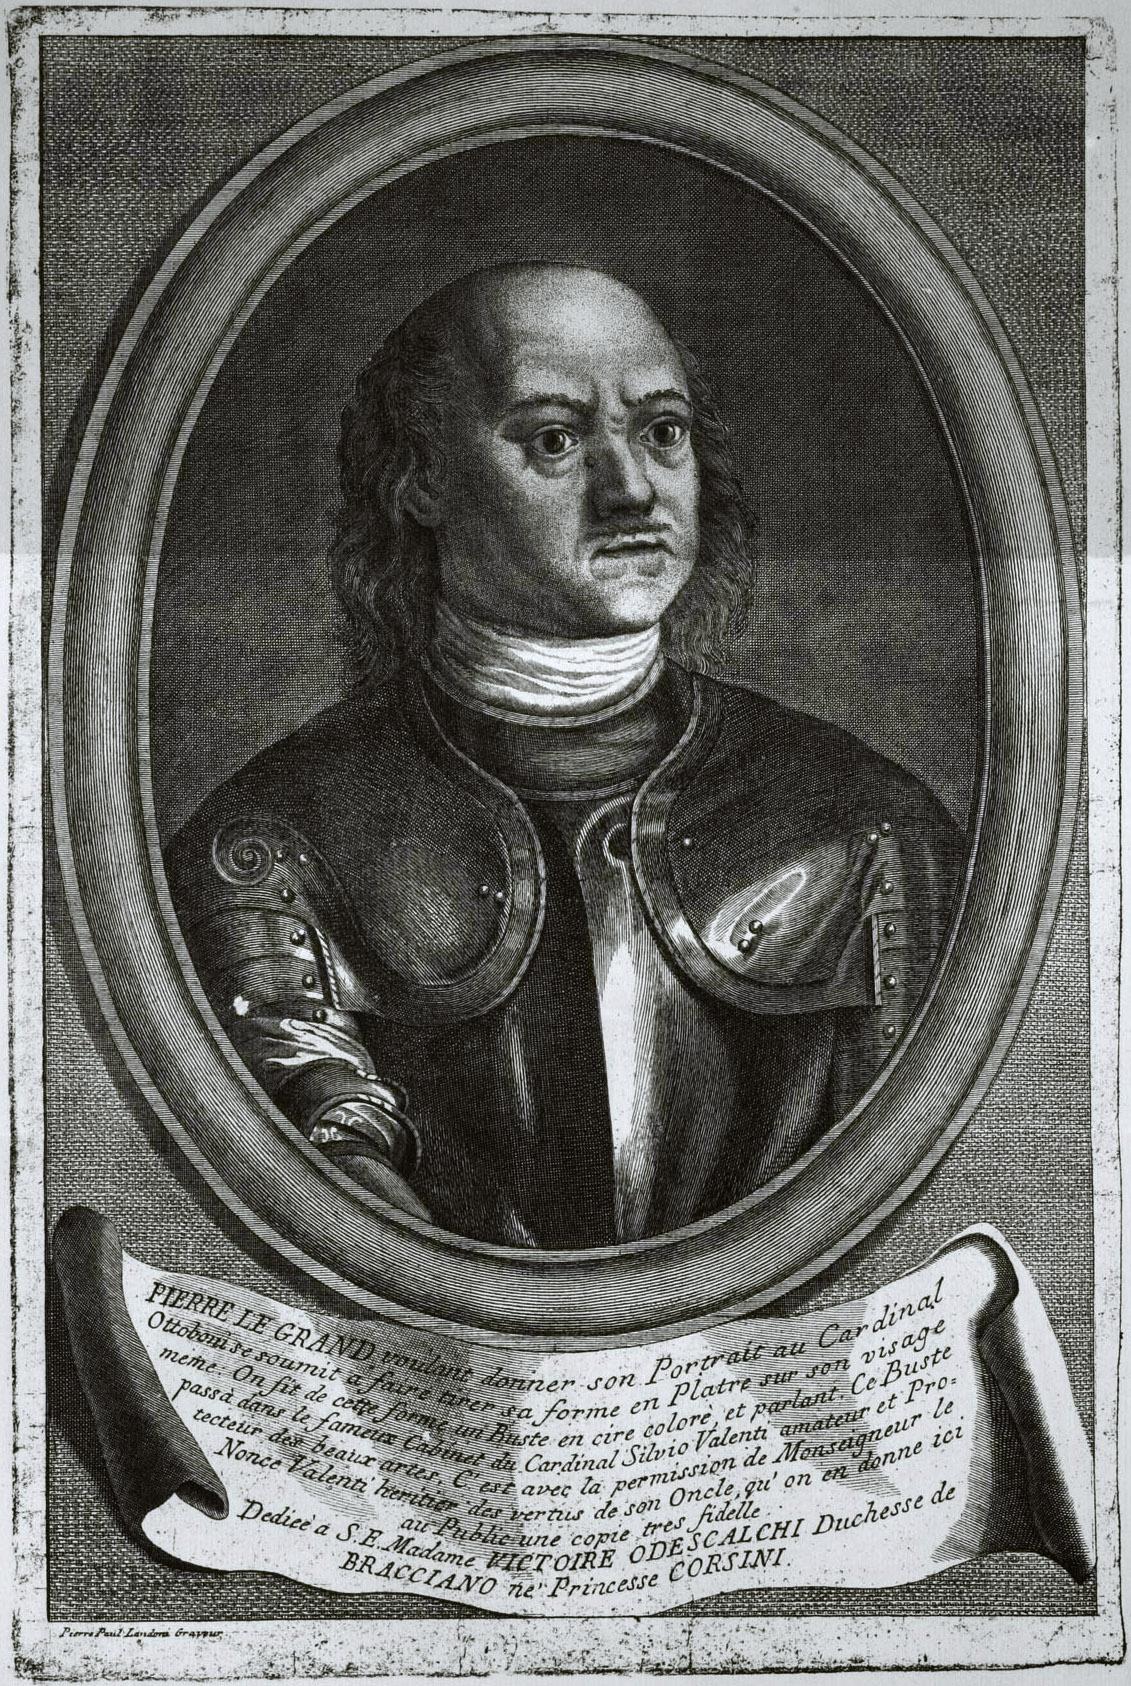 147. Портрет Петра I с воскового бюста